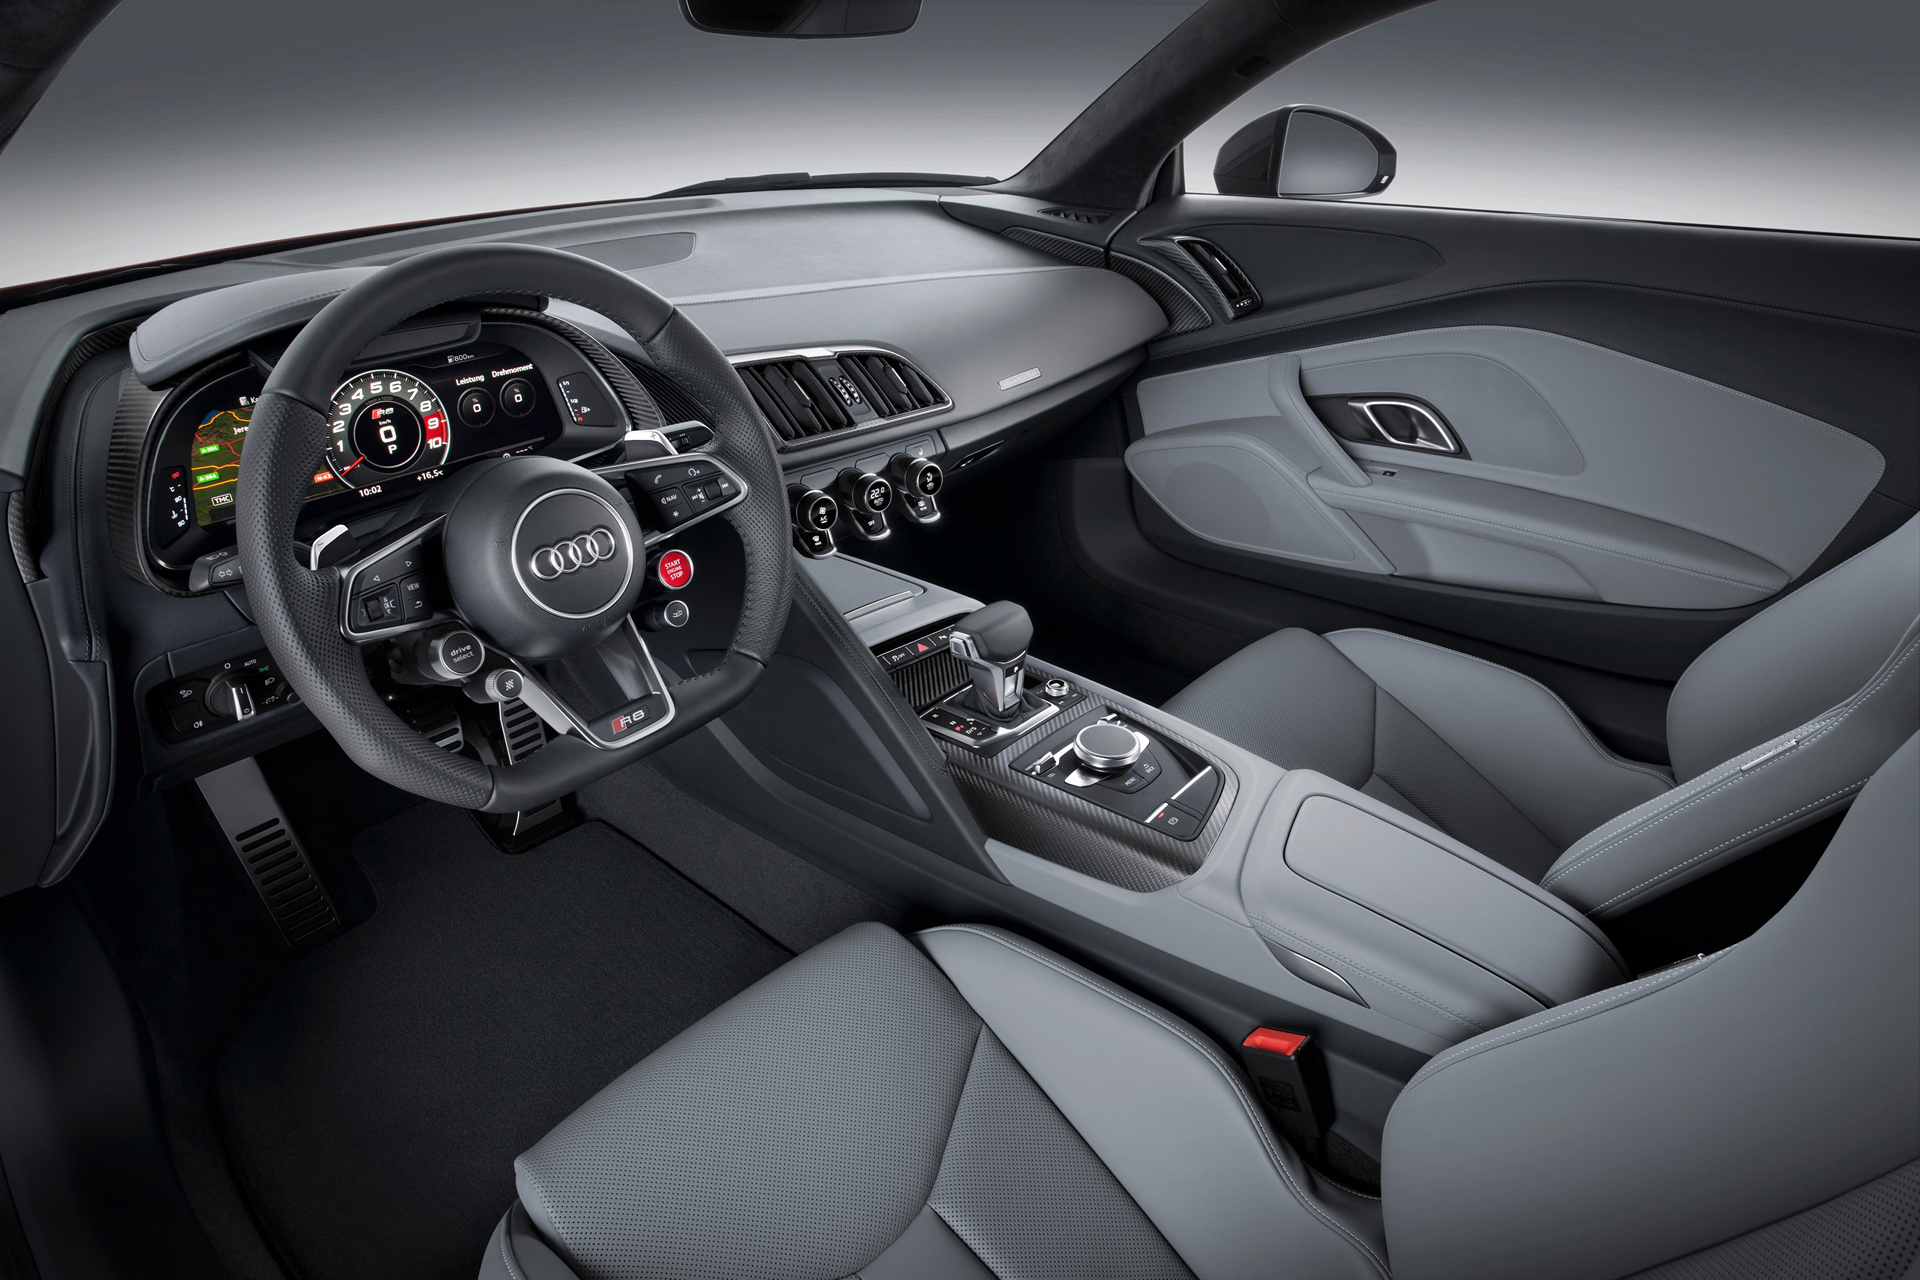 2017 Audi R8 V10 Coupe © Volkswagen AG